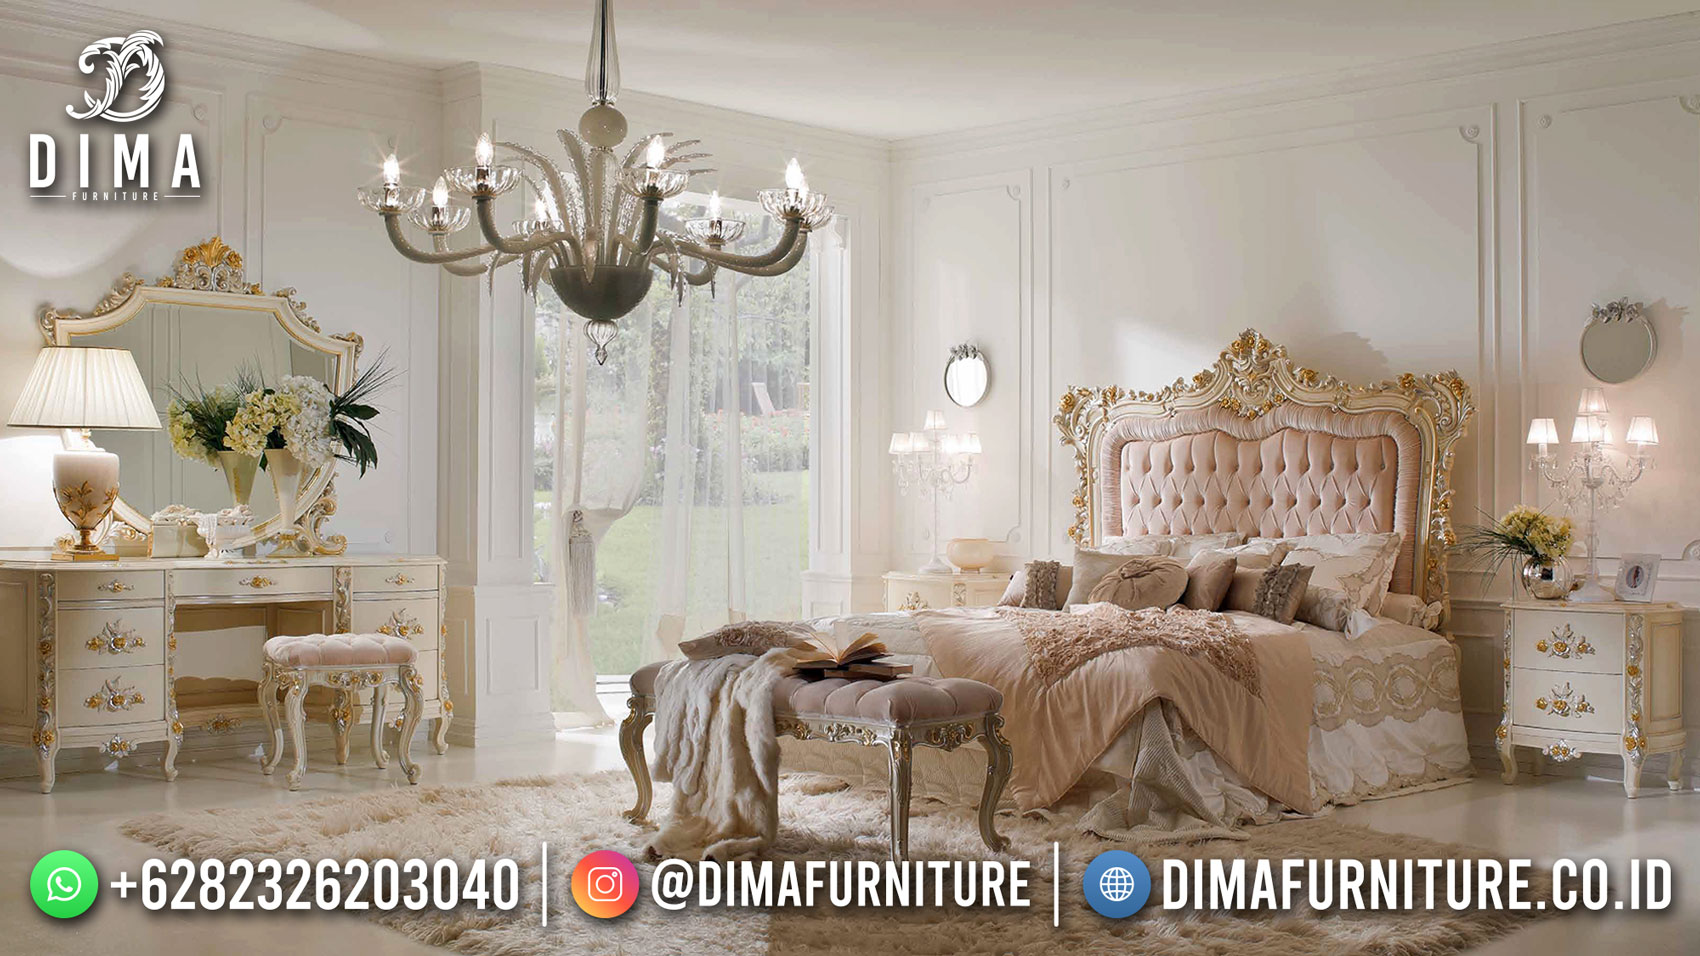 Kamar Set Mewah Jepara, Dipan Ranjang Ukir Luxury Classic New Design ST-1413